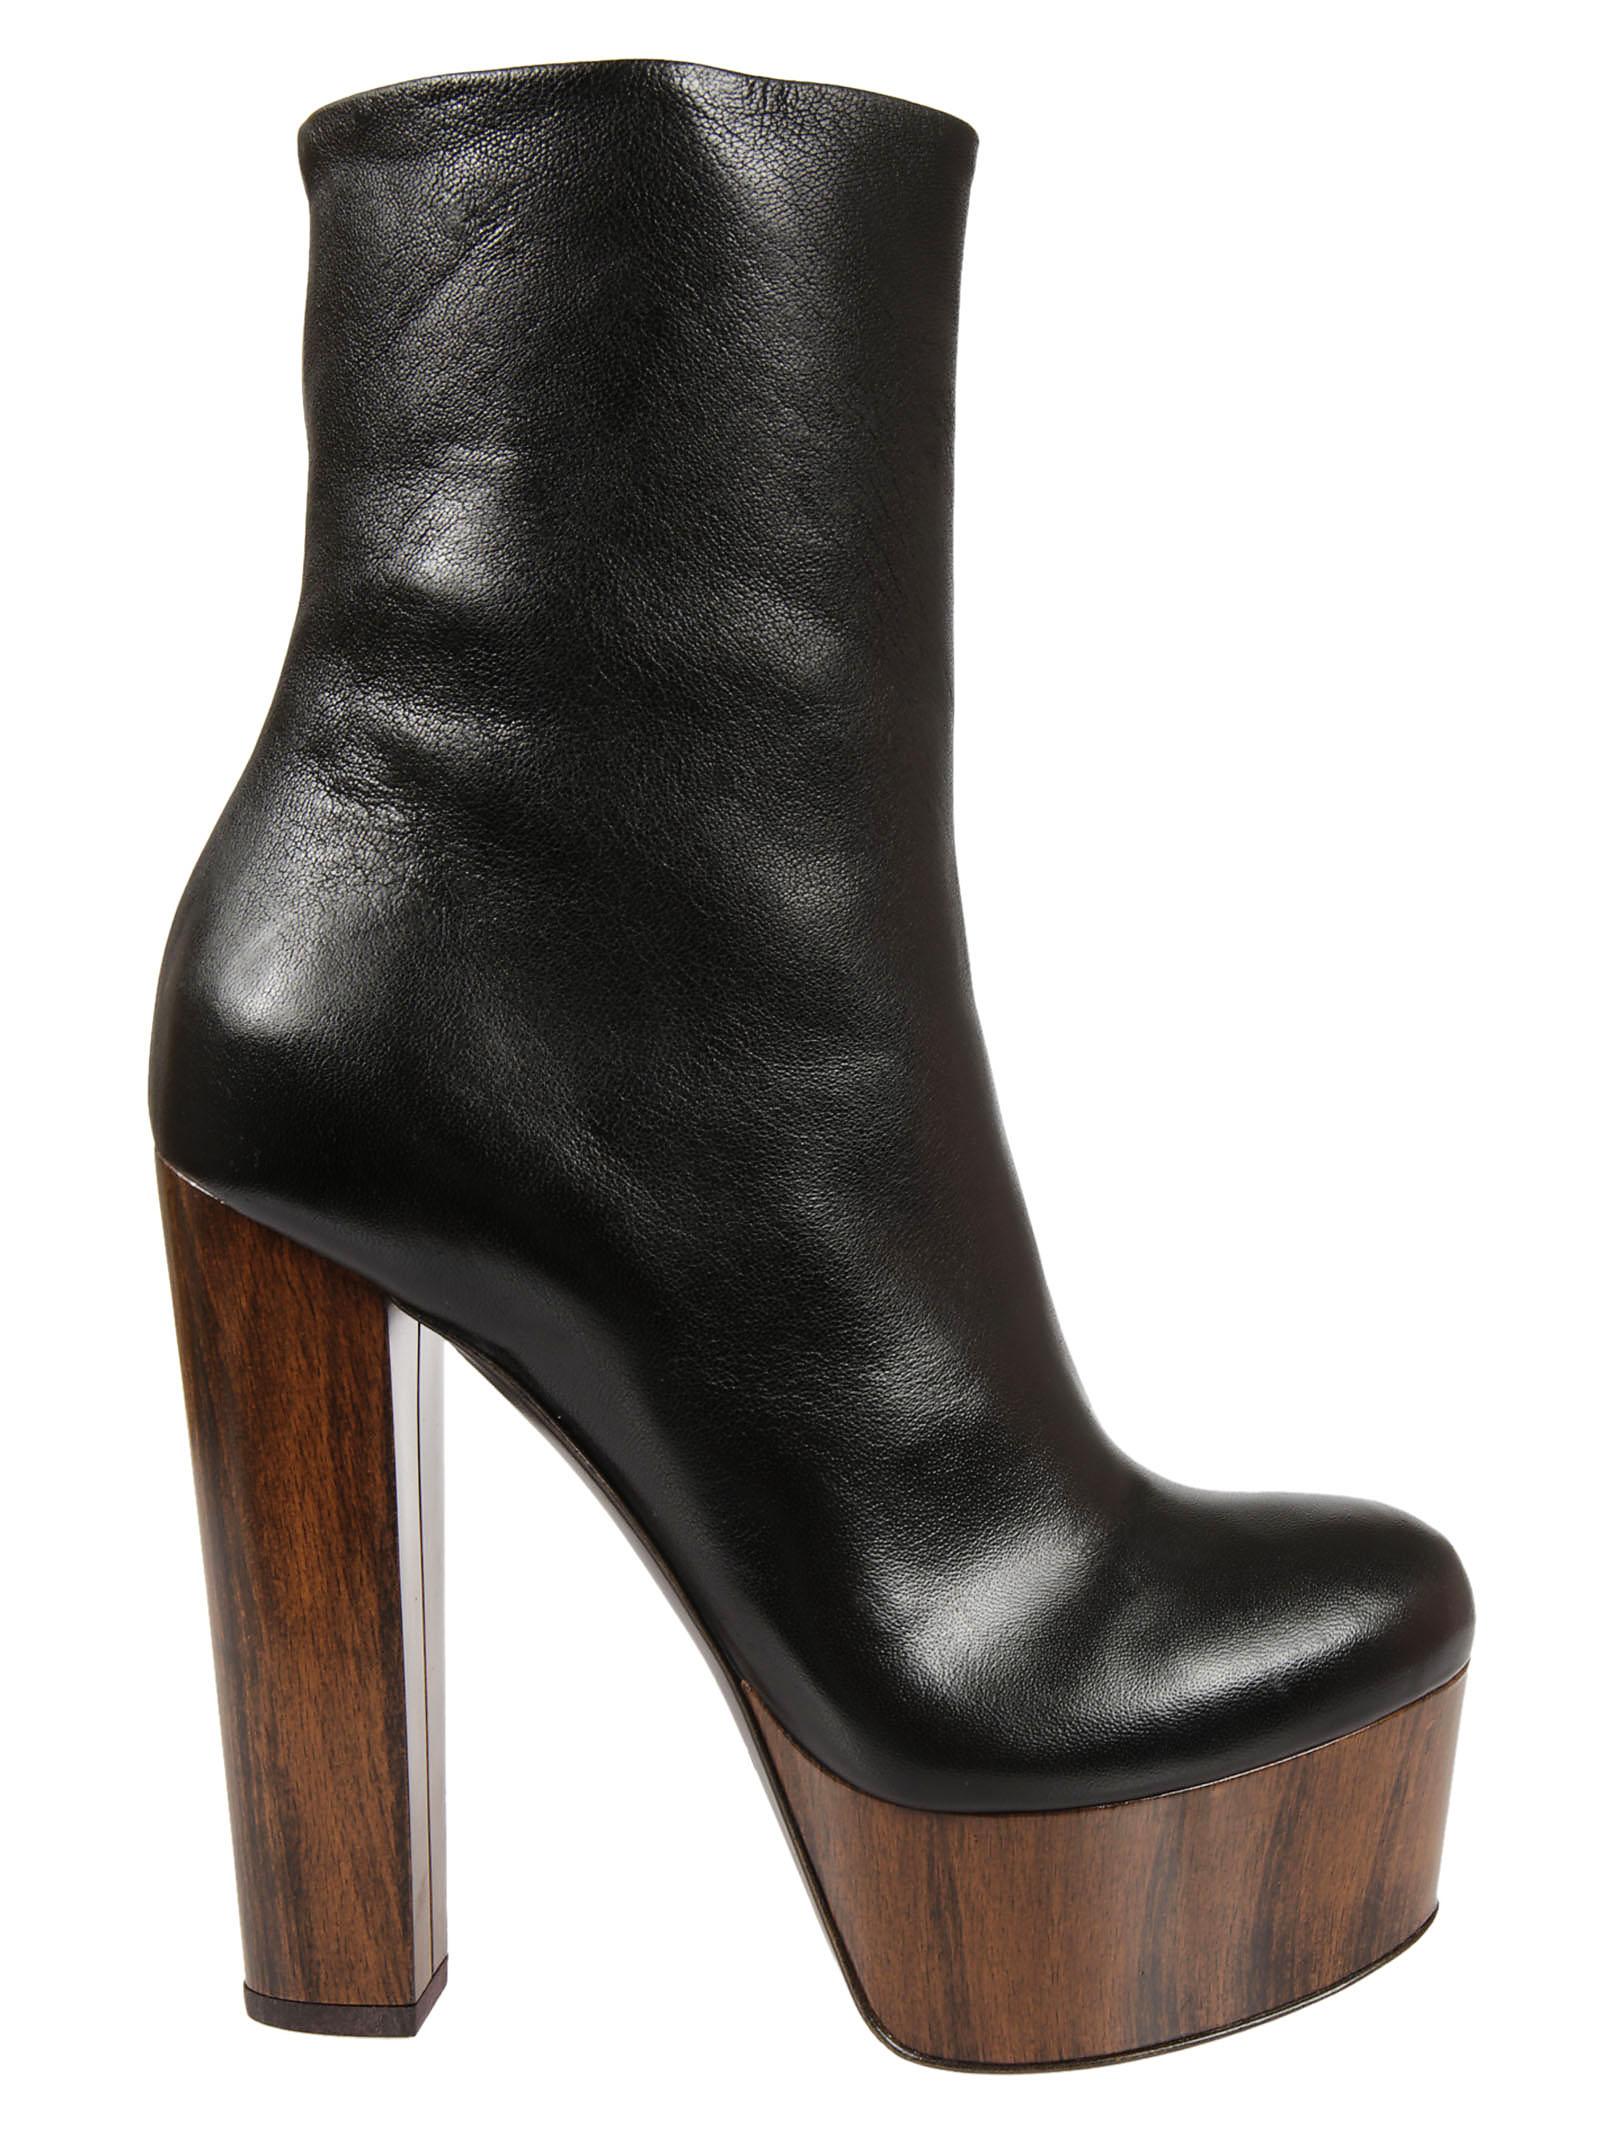 luca valentini Luca Valentini High-Heel Boots